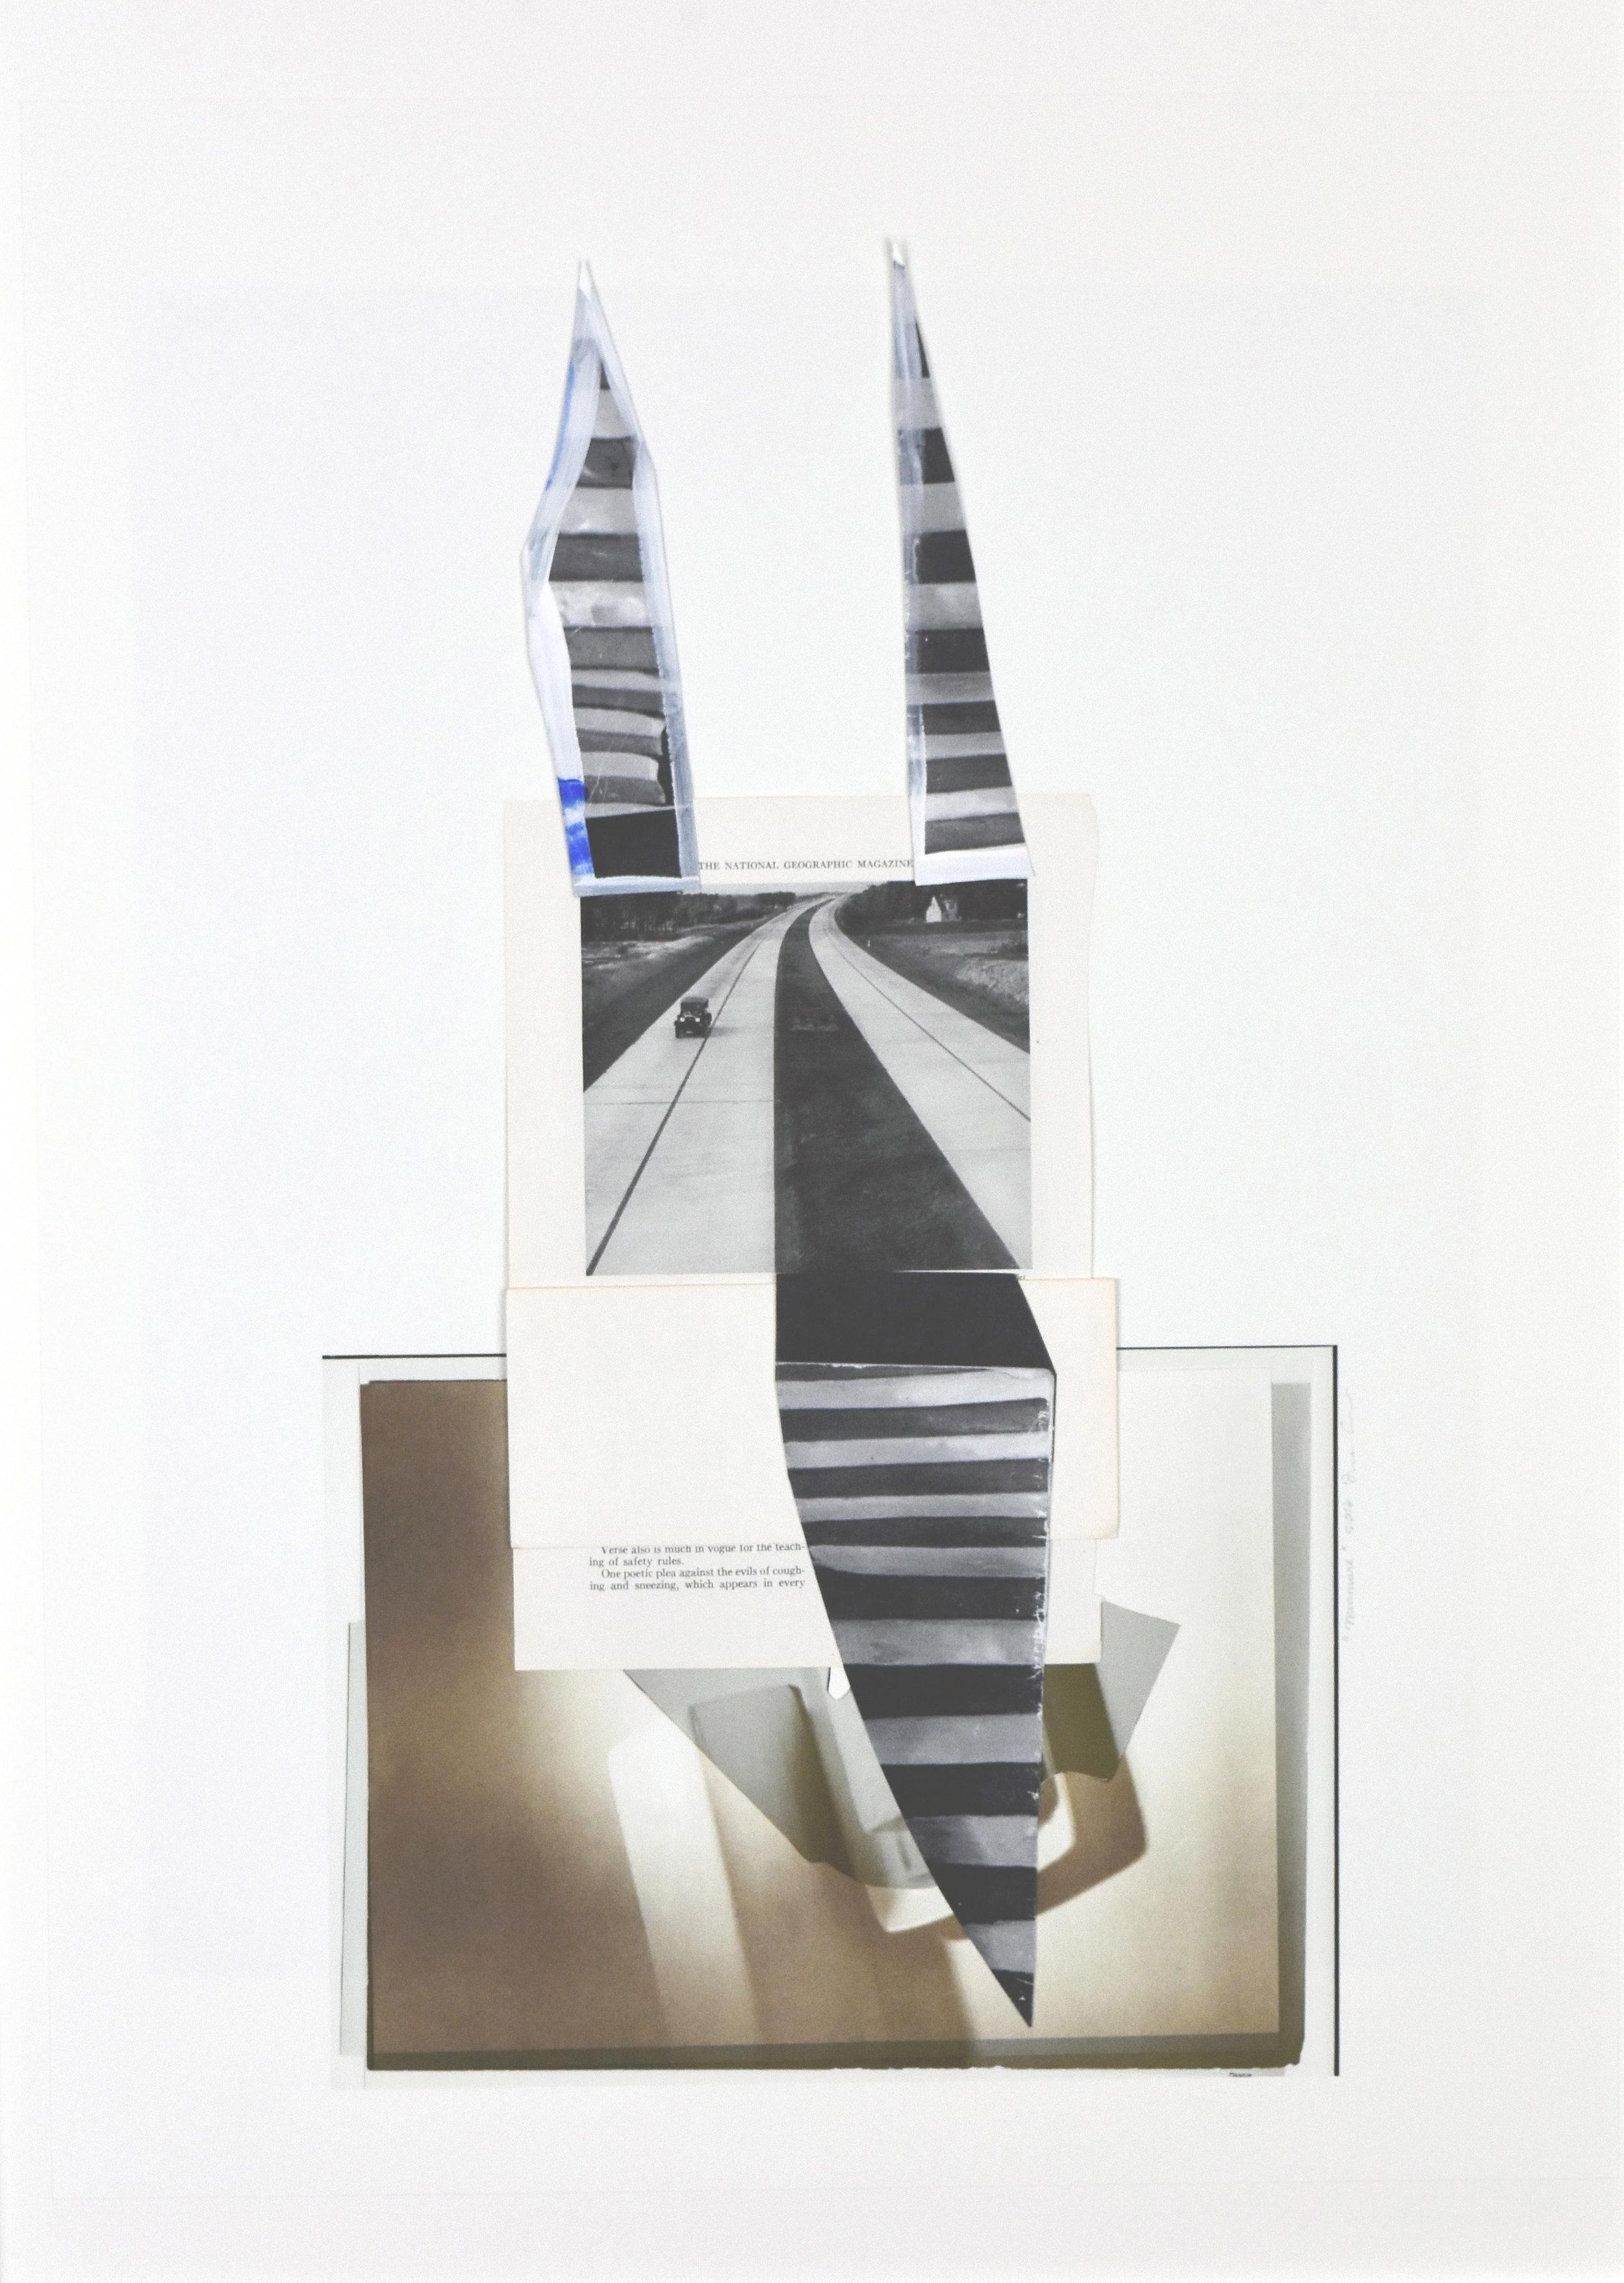 """Vintage focalpoint"", epson print, photocopy, paint, found image, 16""x 24"", 2016"